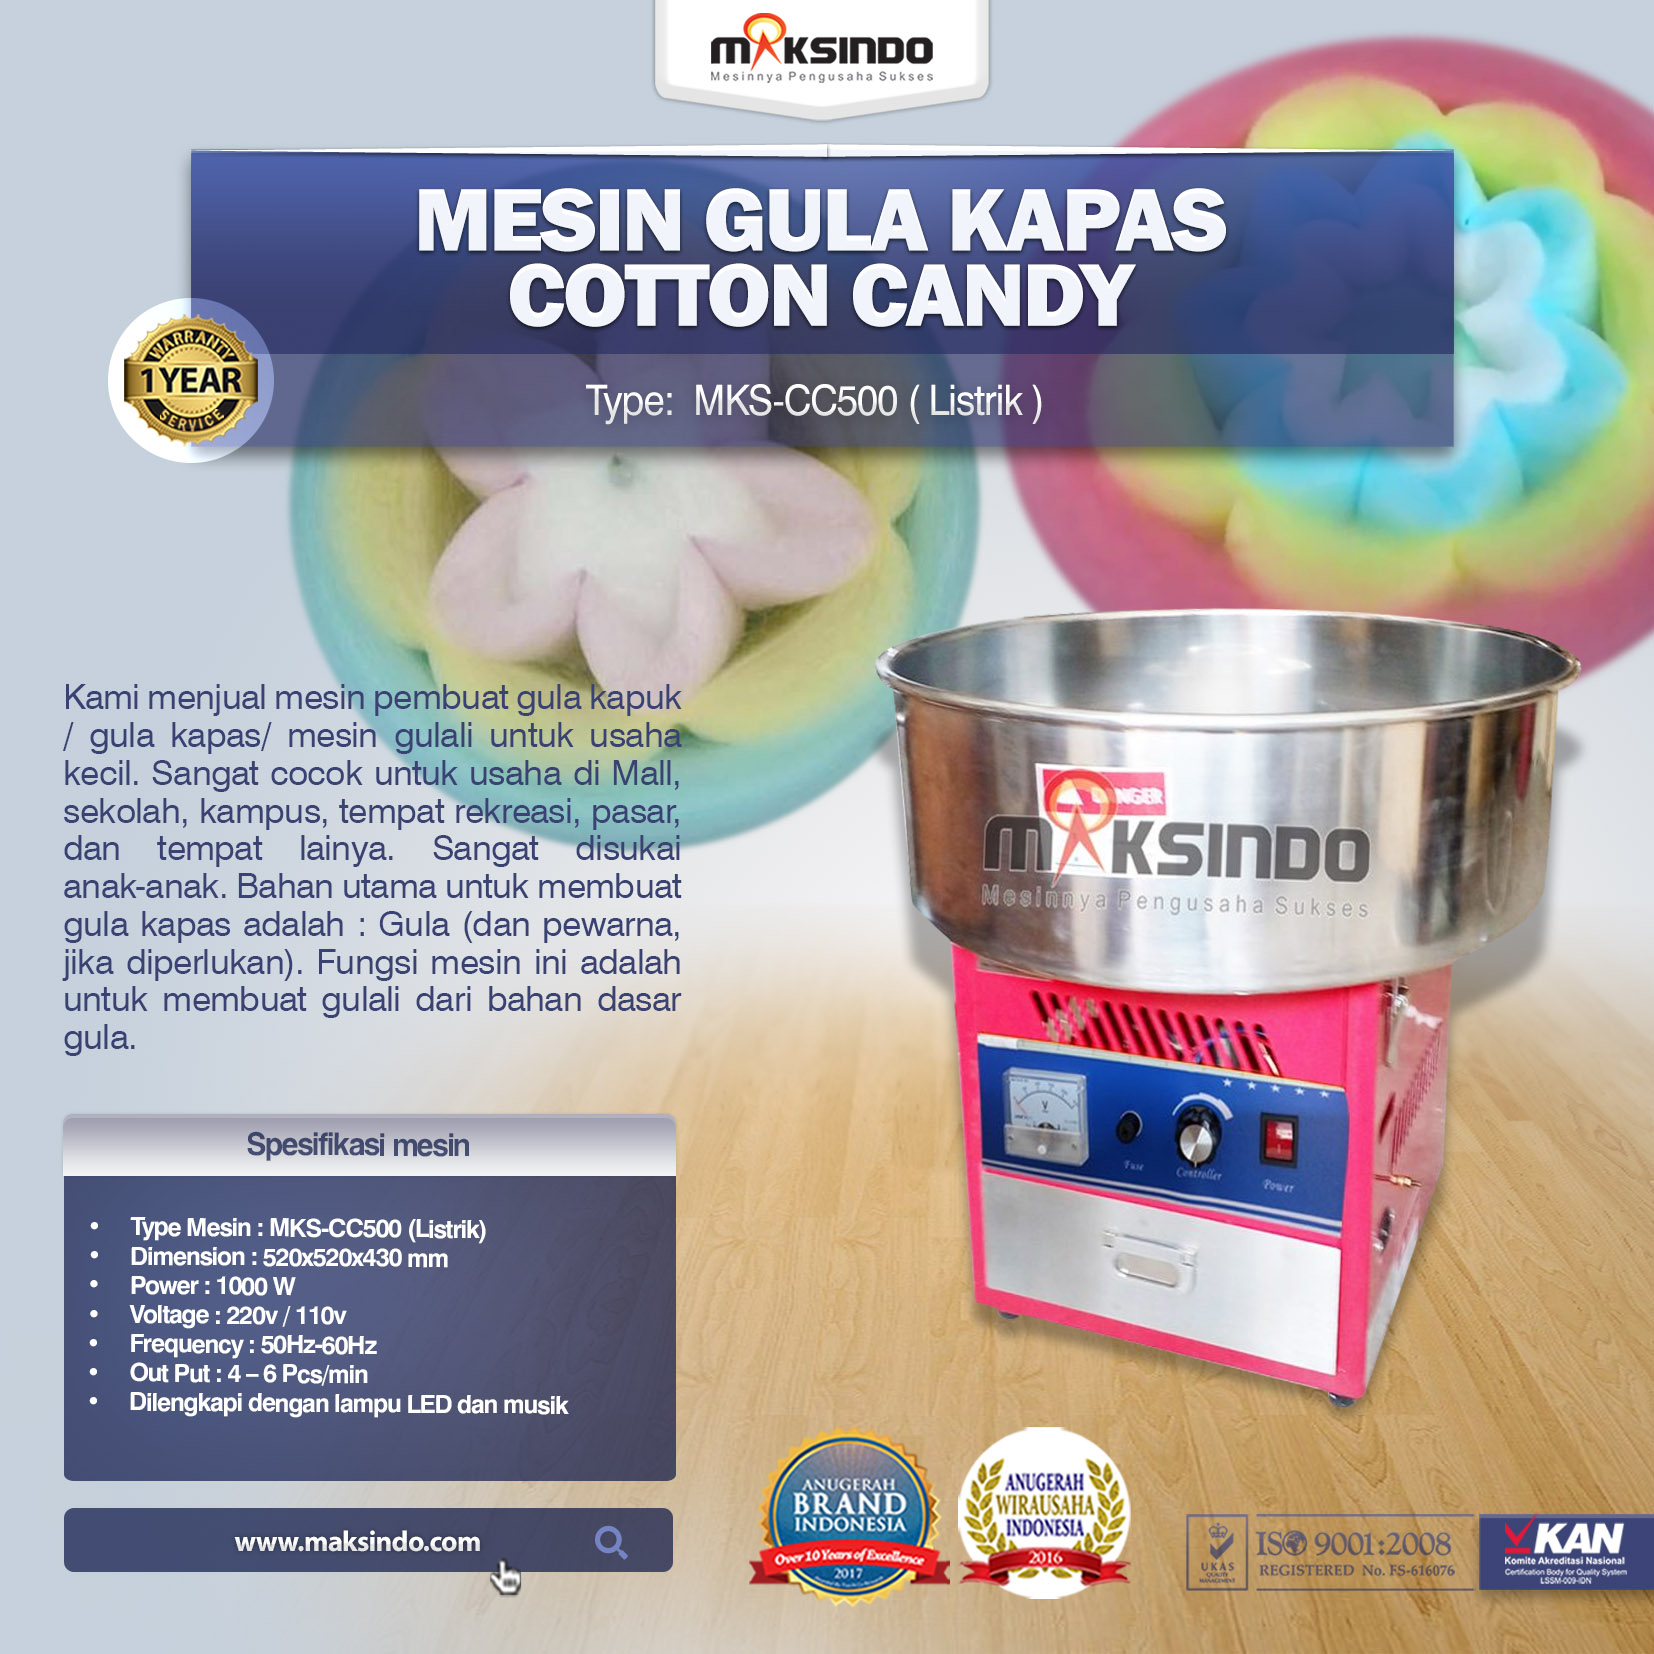 Mesin GULALI Cotton Candy MKS-CC500 (Listrik)